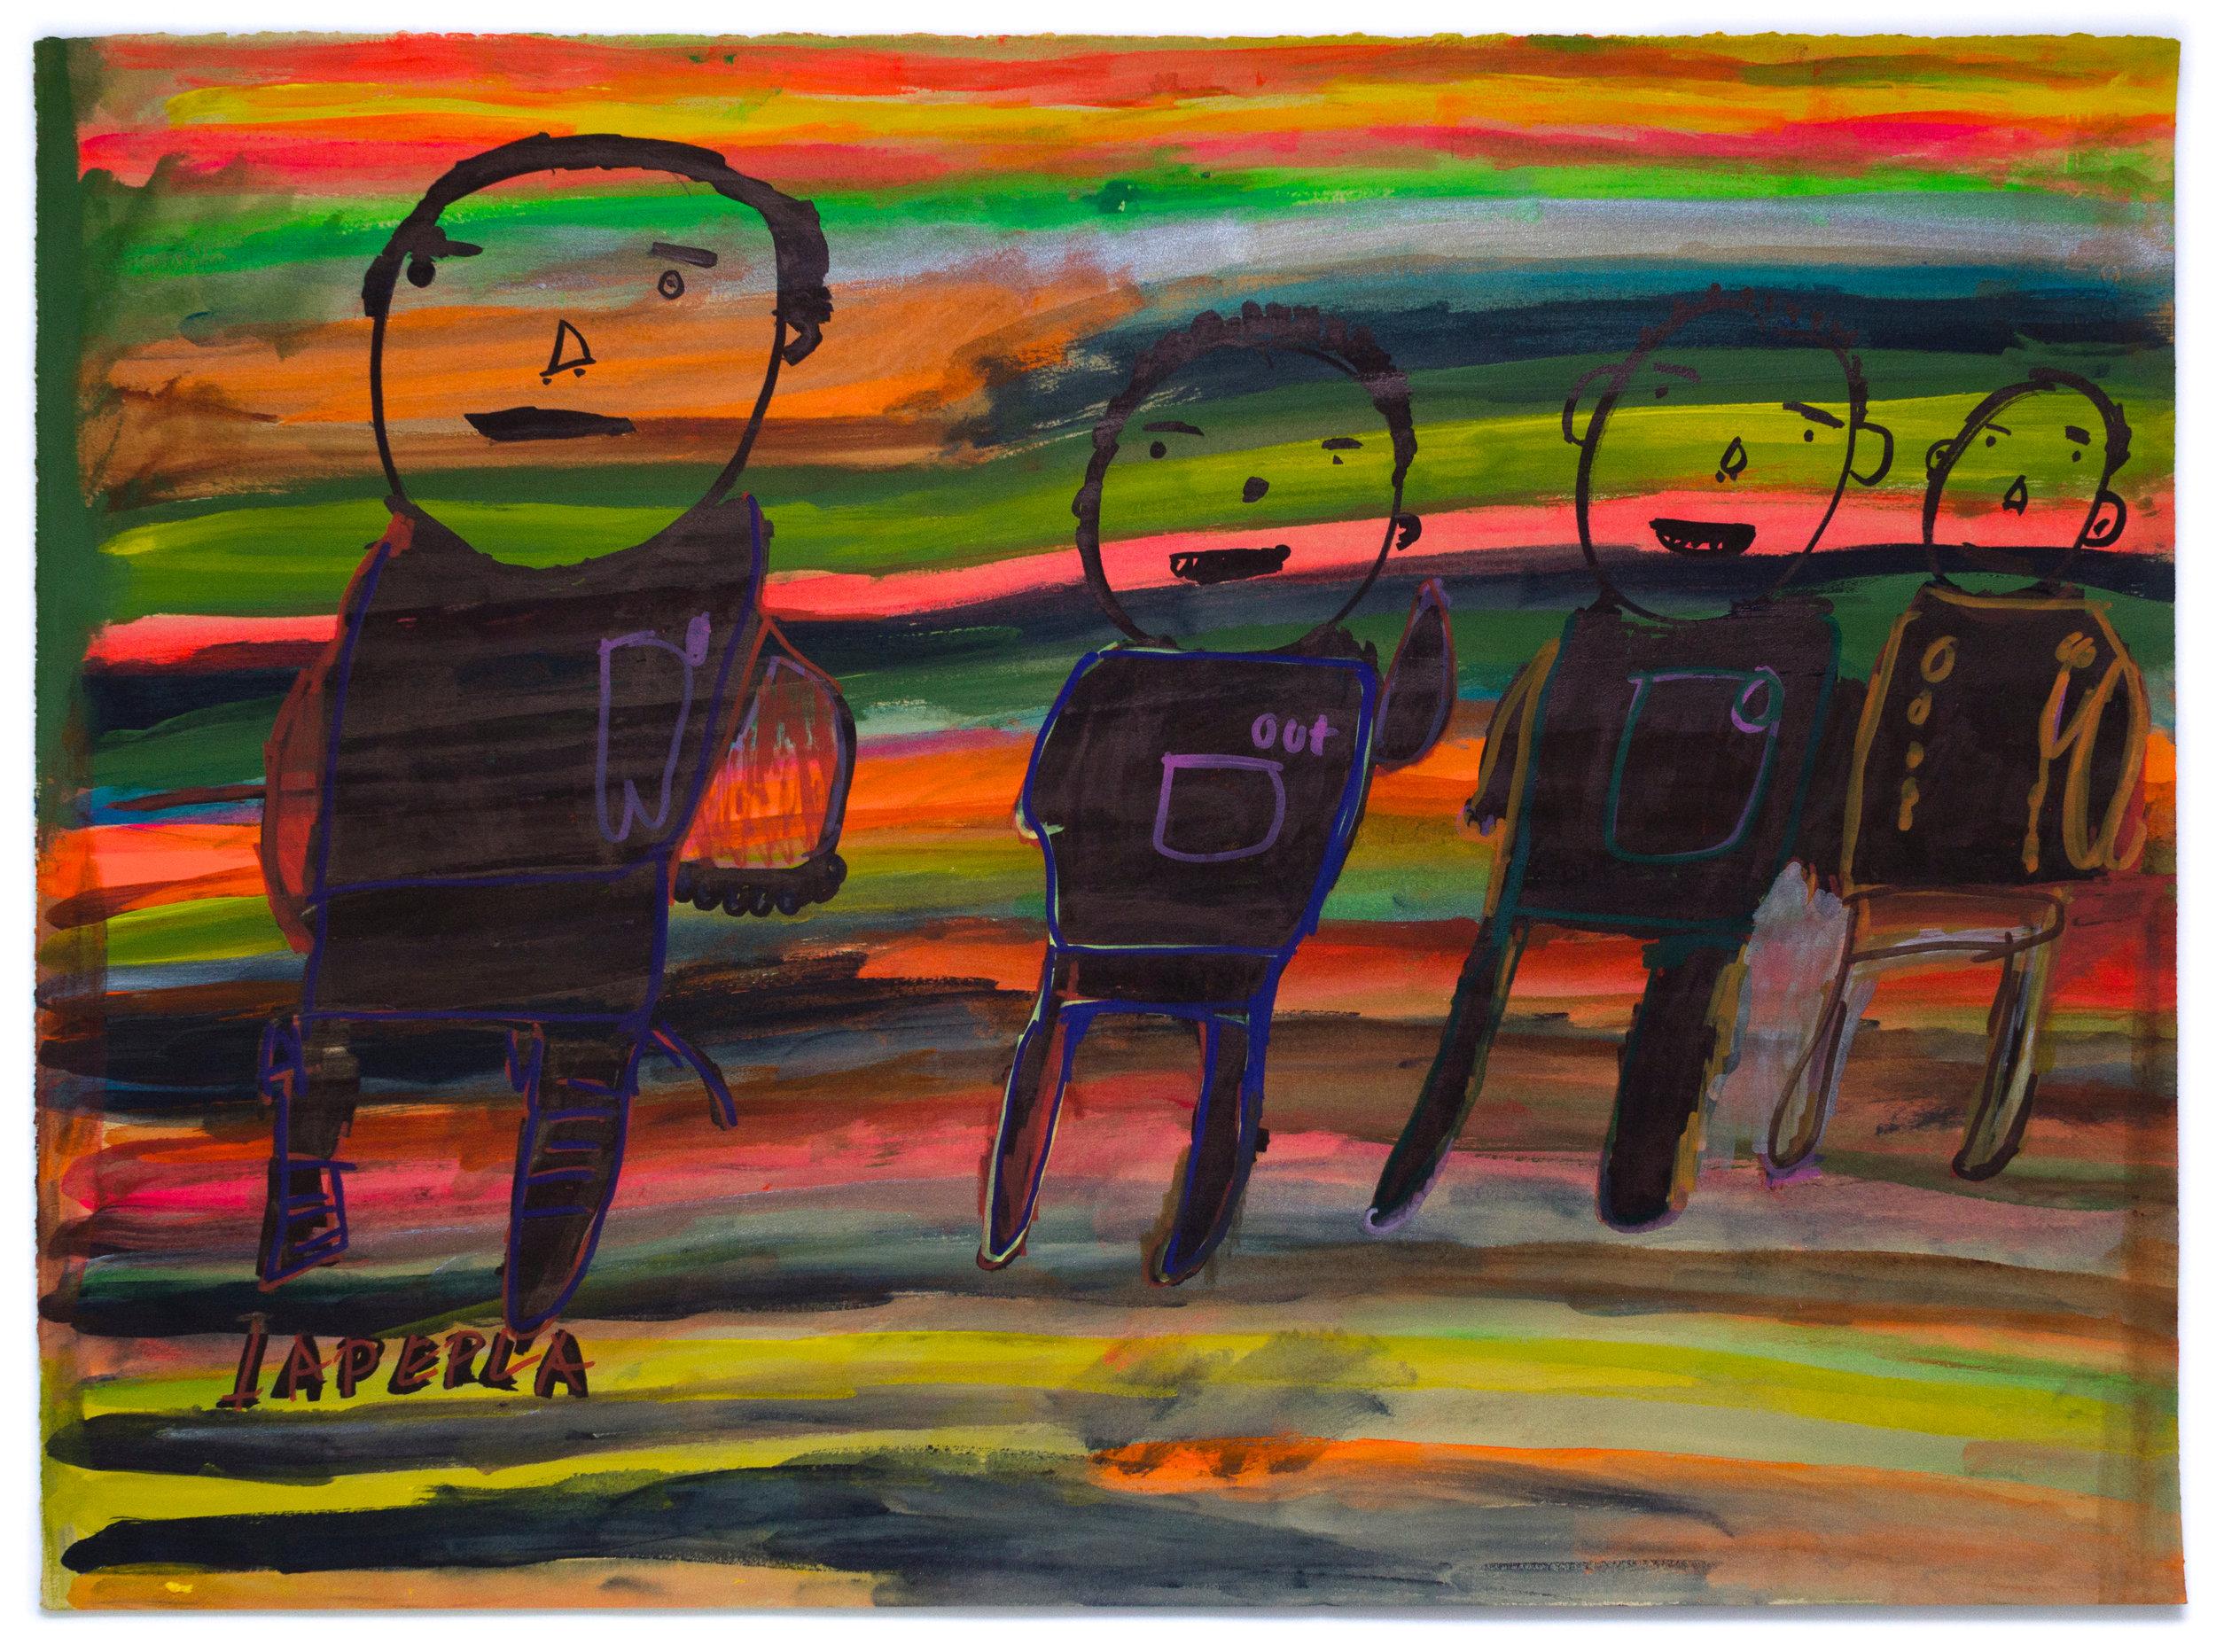 Paulino Martin, Untitled (PM 086), 2017, 22 x 30.25 inches